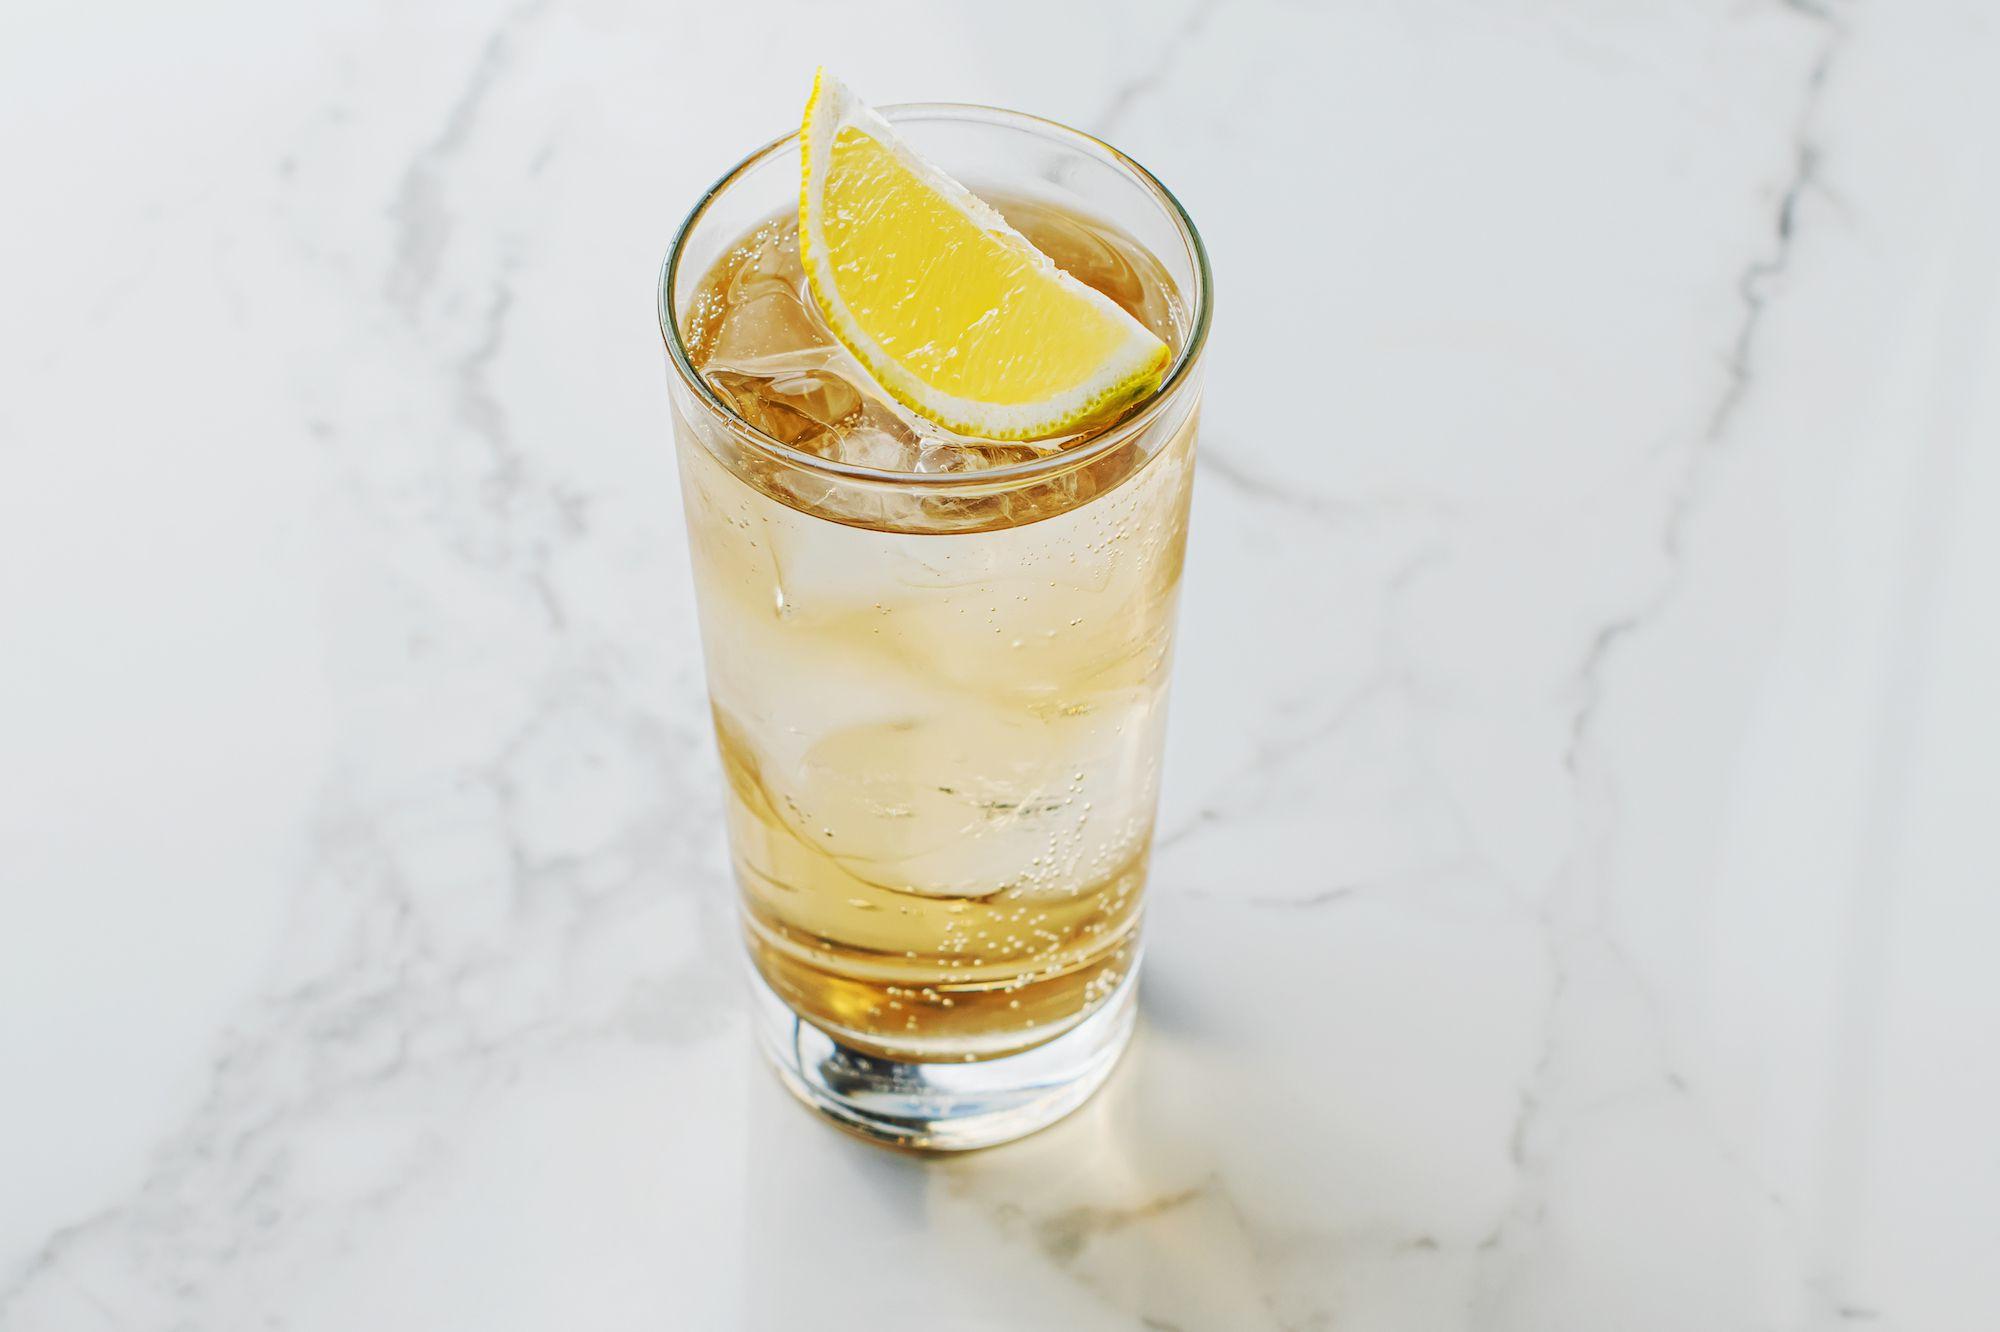 Gin buck garnished with lemon wedge